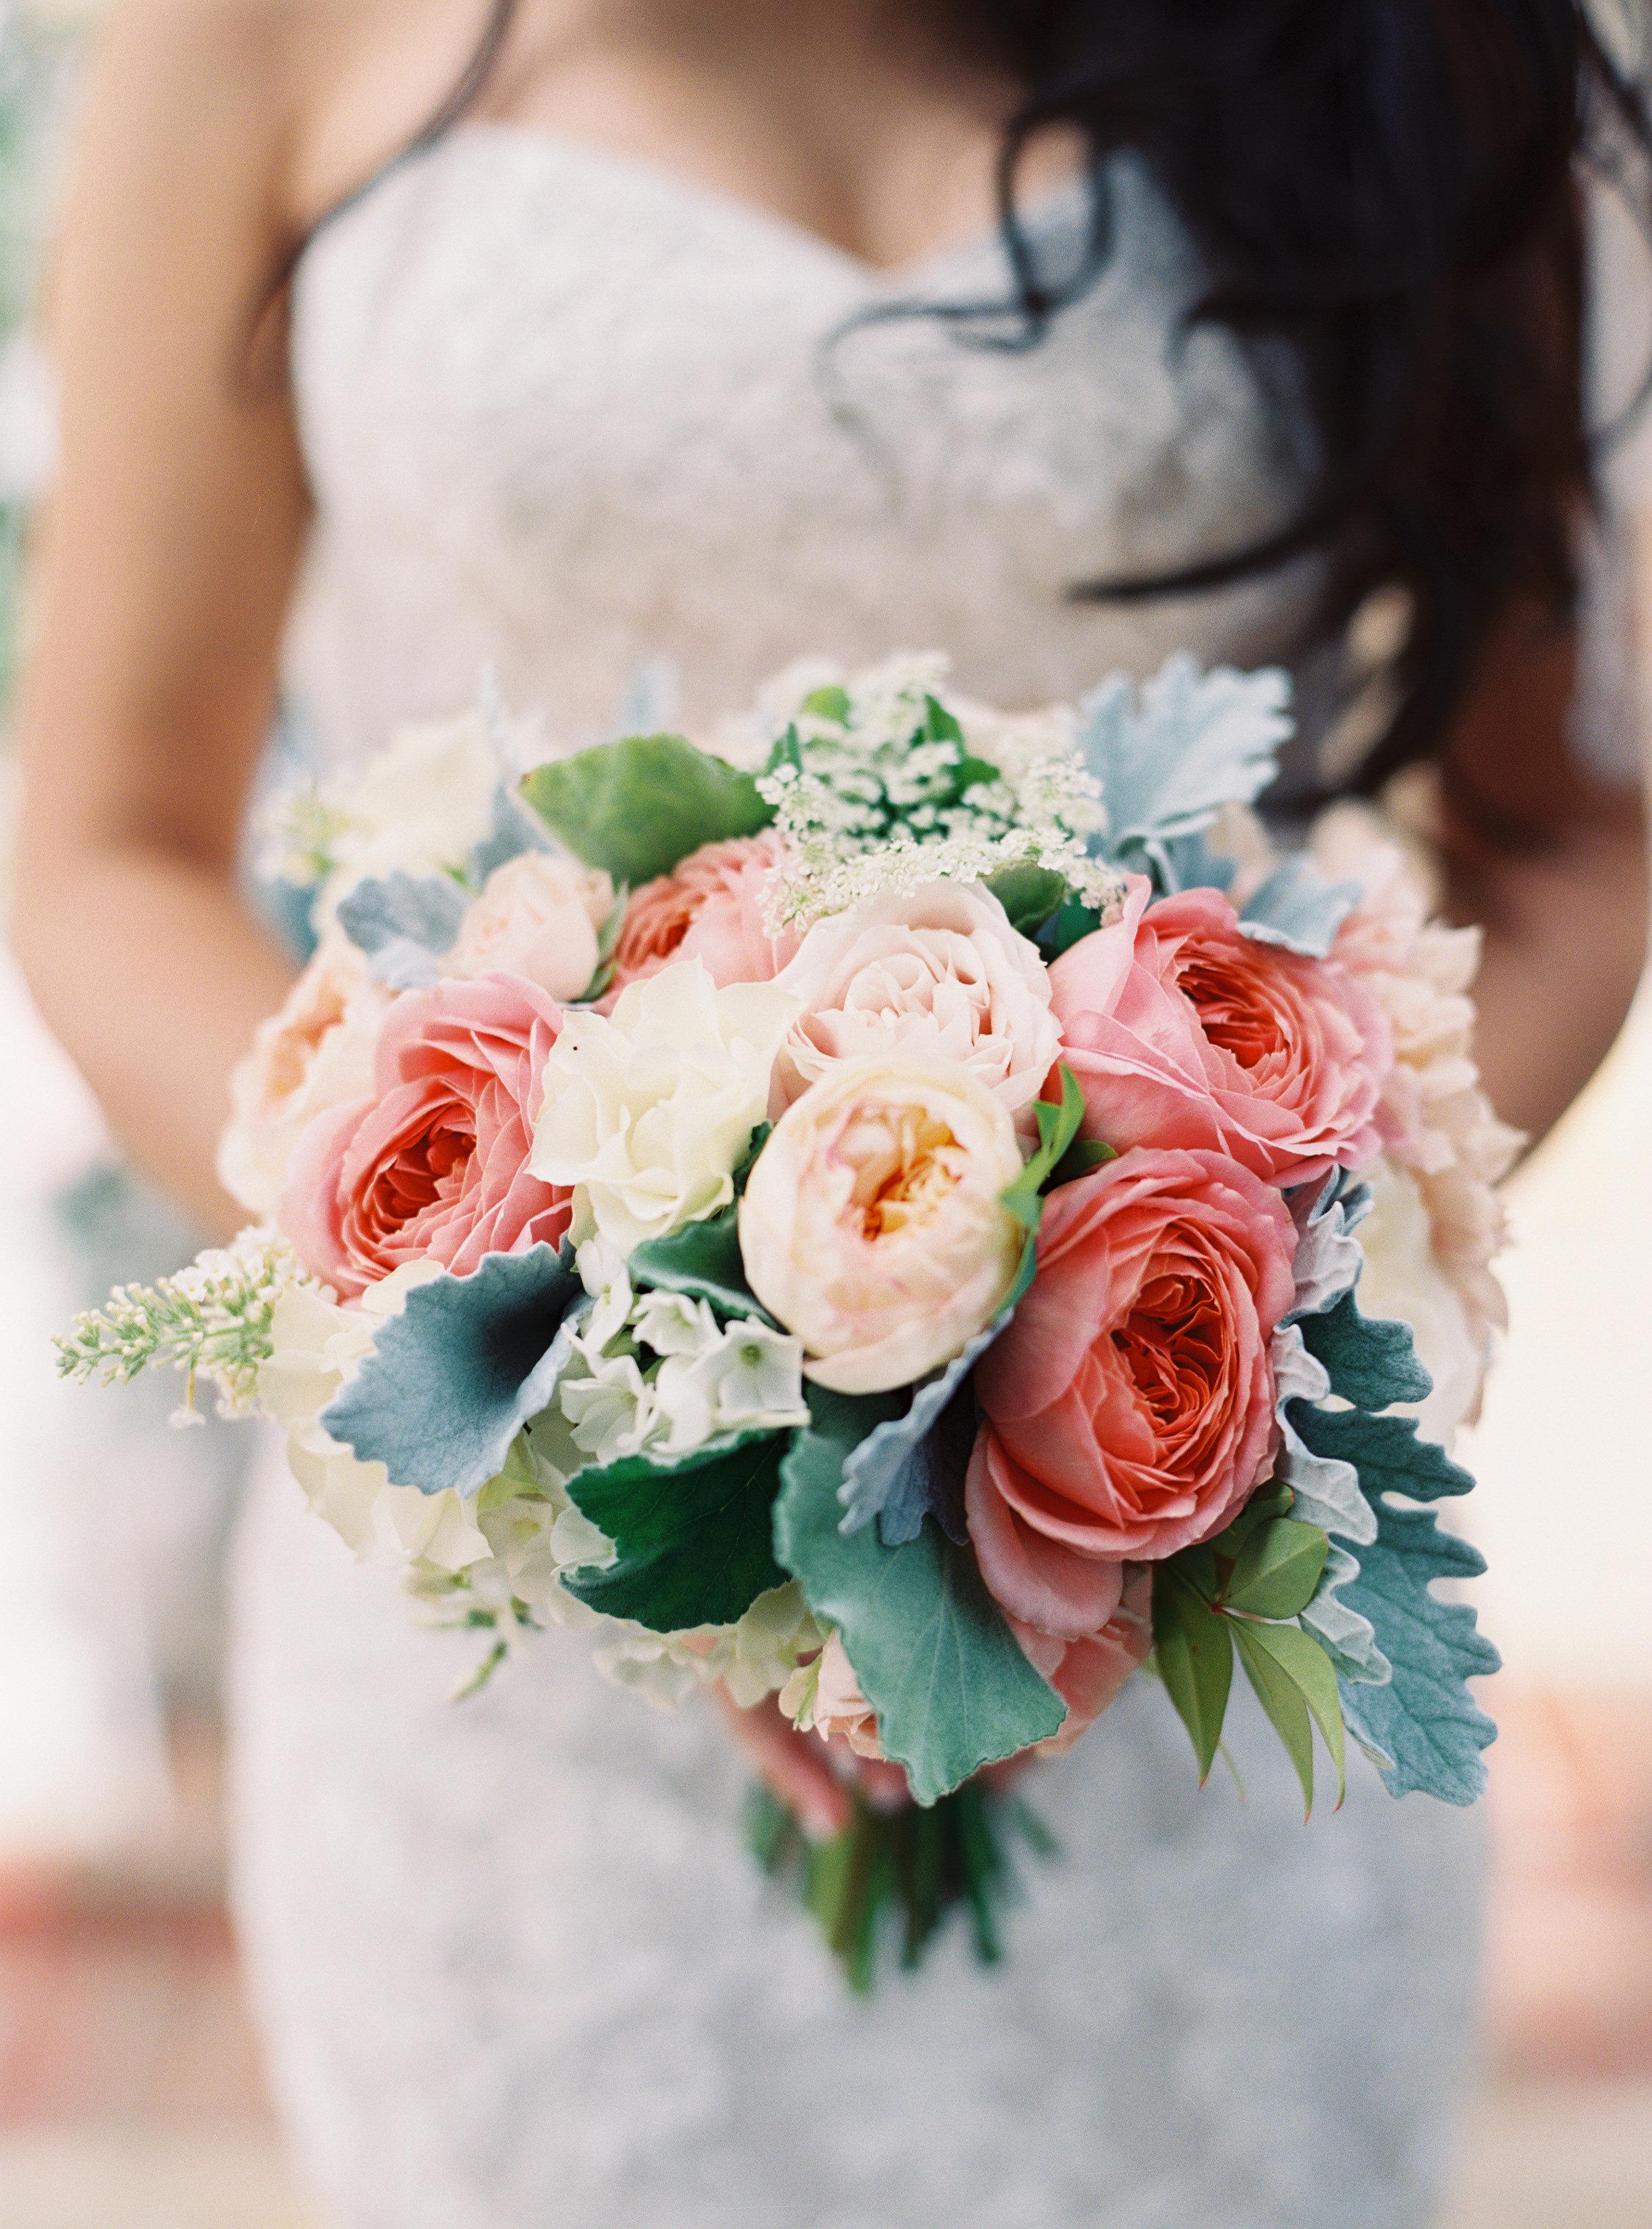 LindaTranPhotography-Flowerstory-Saratoga-wedding-bouquet.jpg